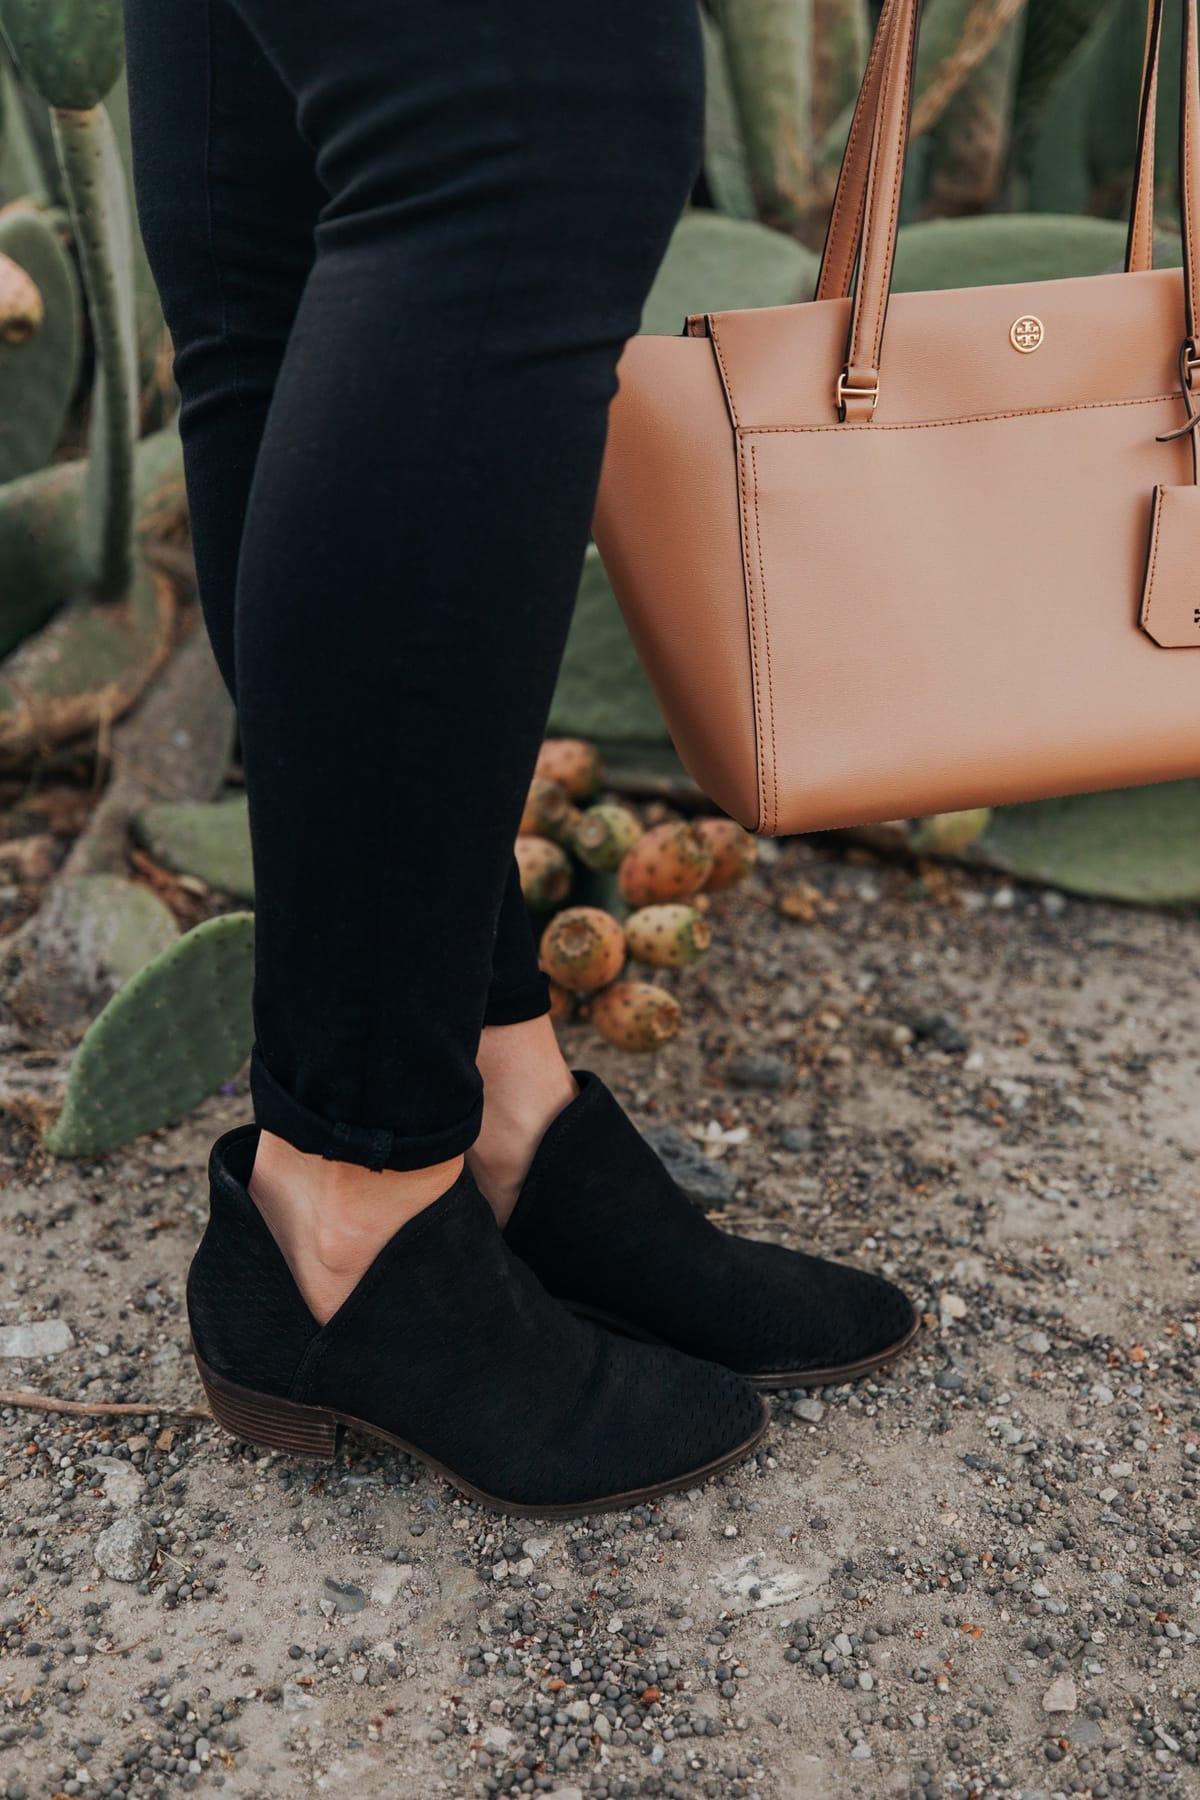 western black booties for winter